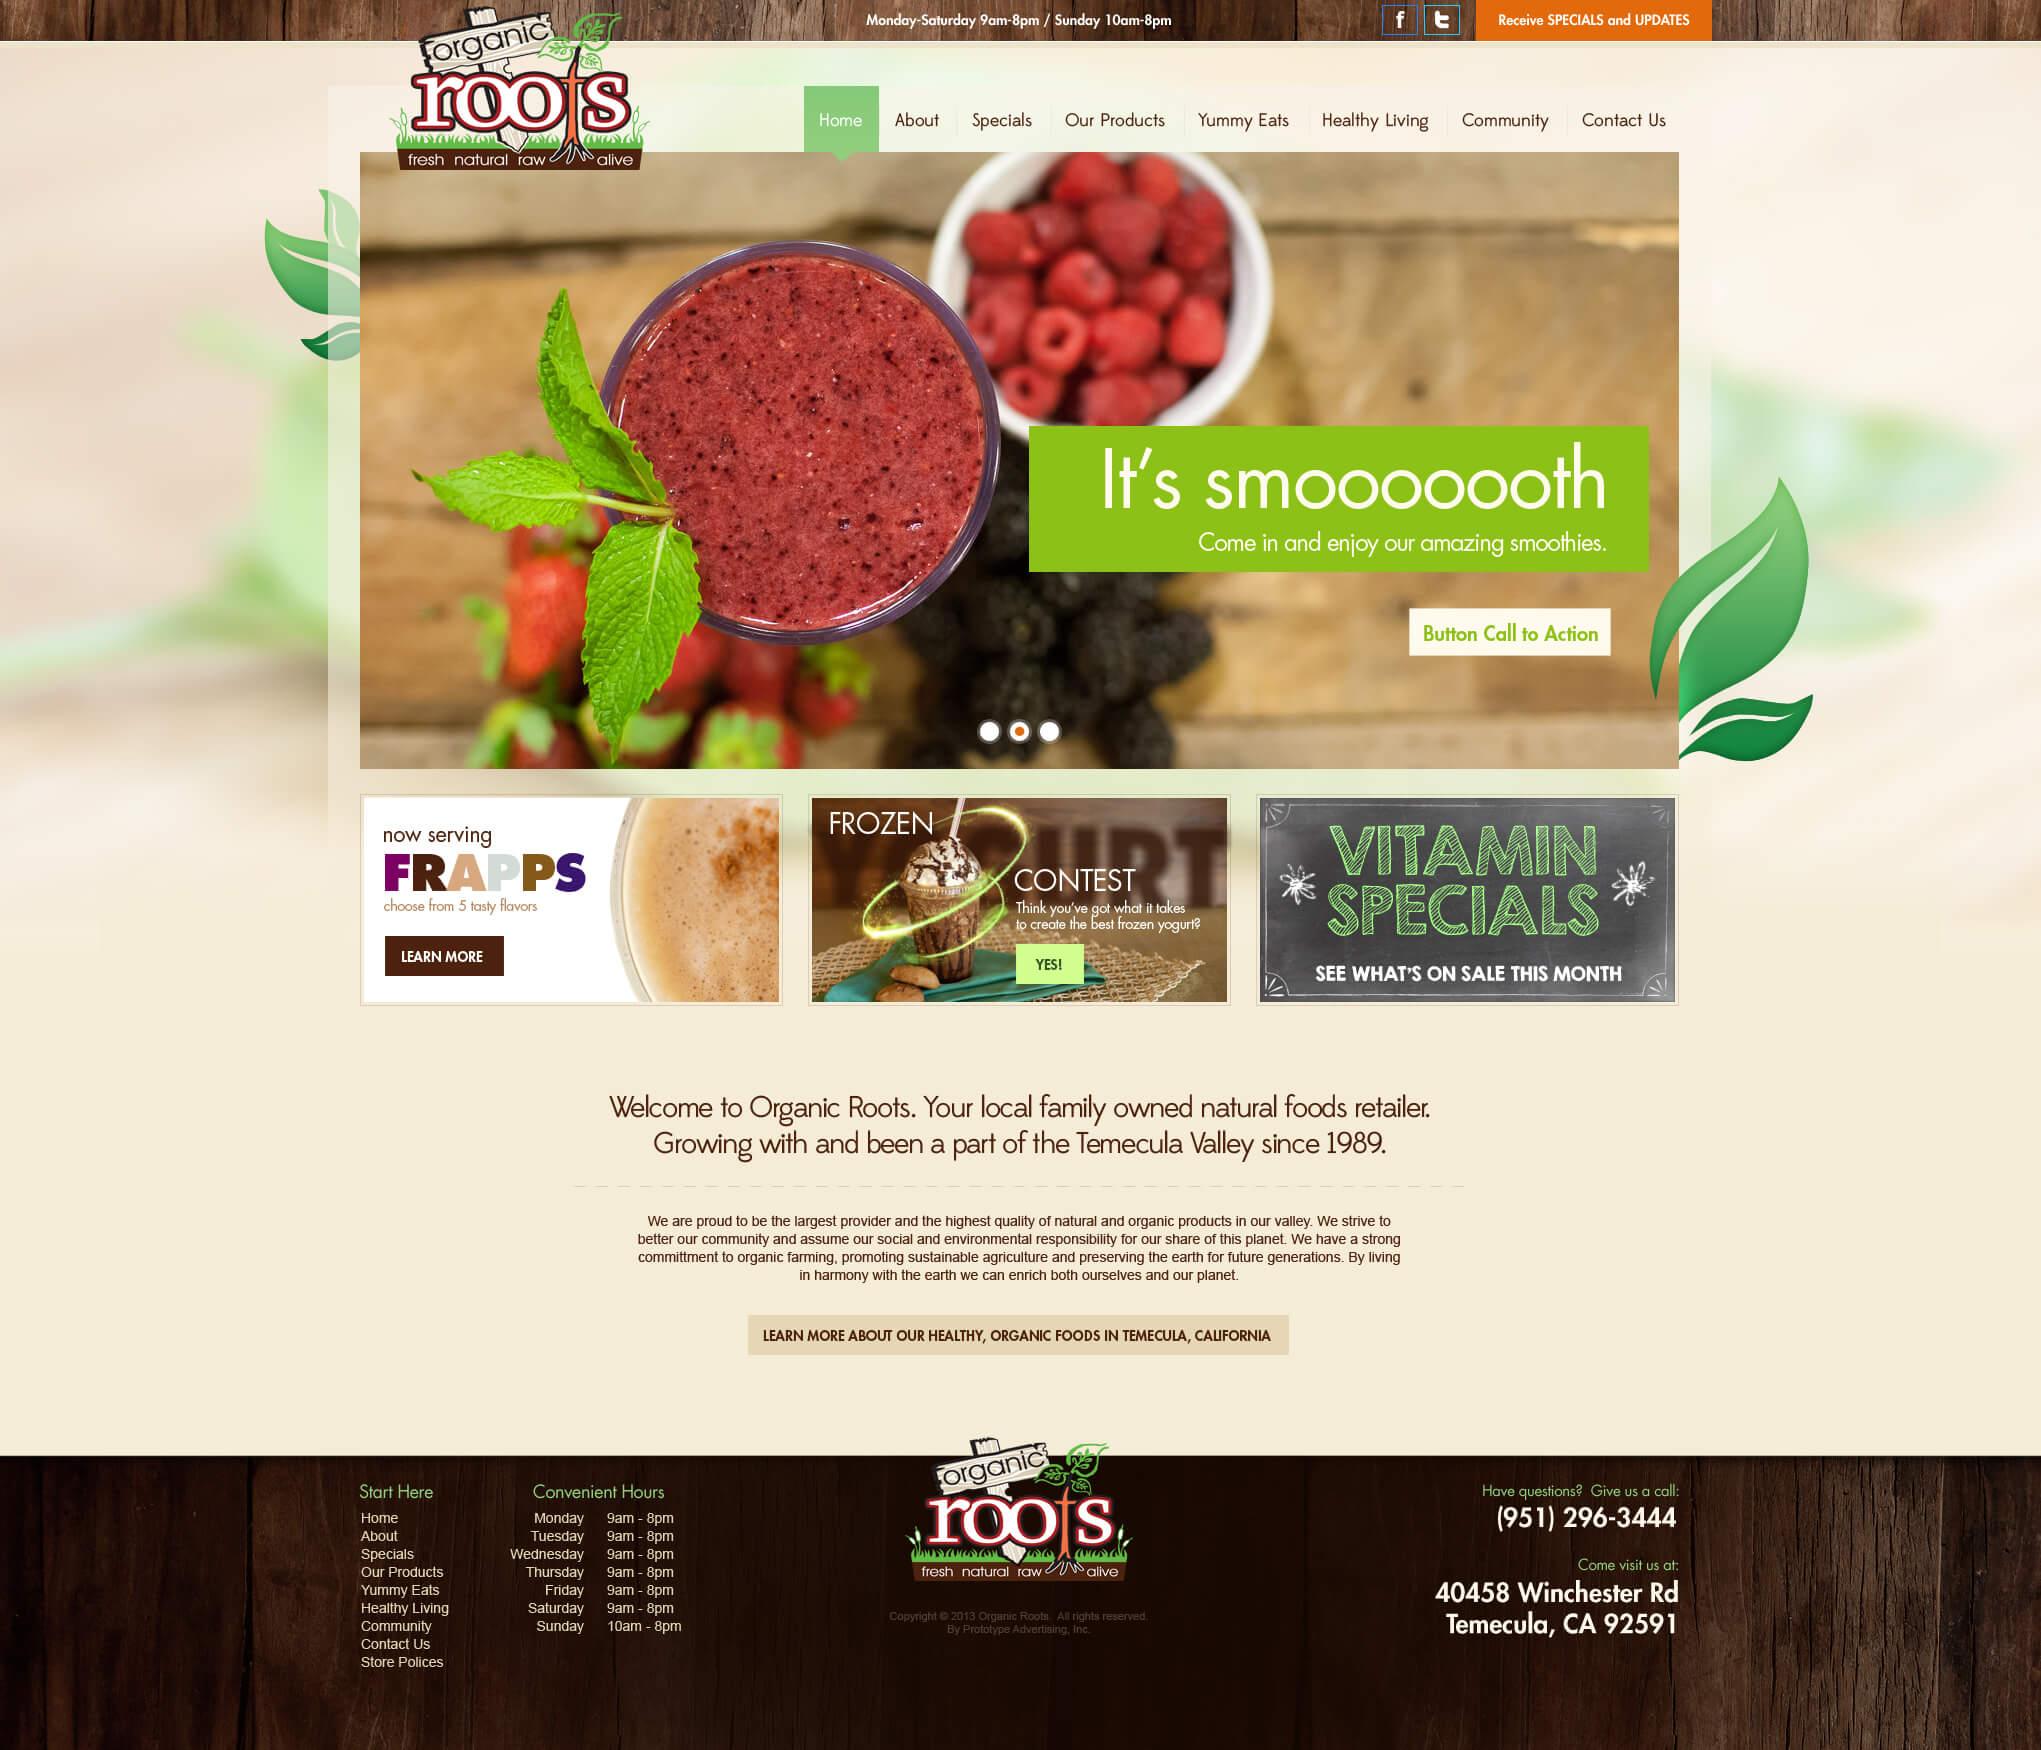 Organic Roots